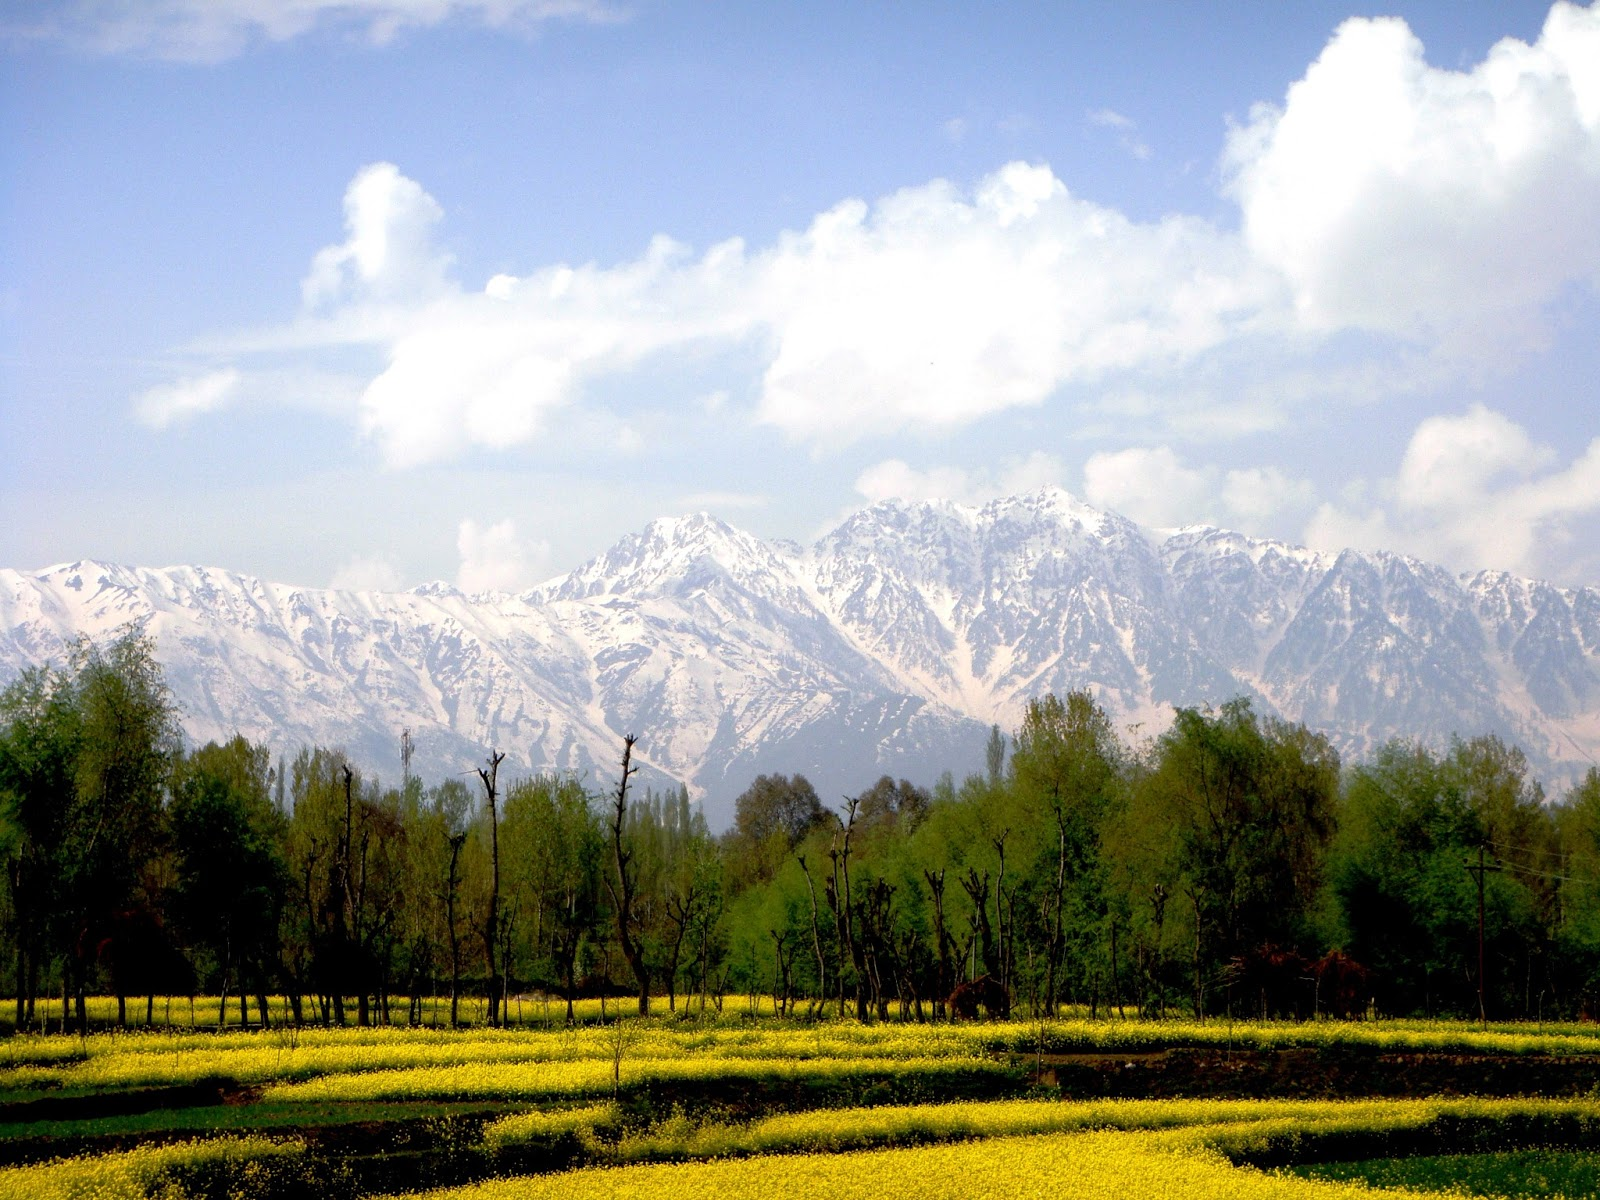 Chinar Shade Mustard Flowers Bloom In Spring Season Of Kashmir